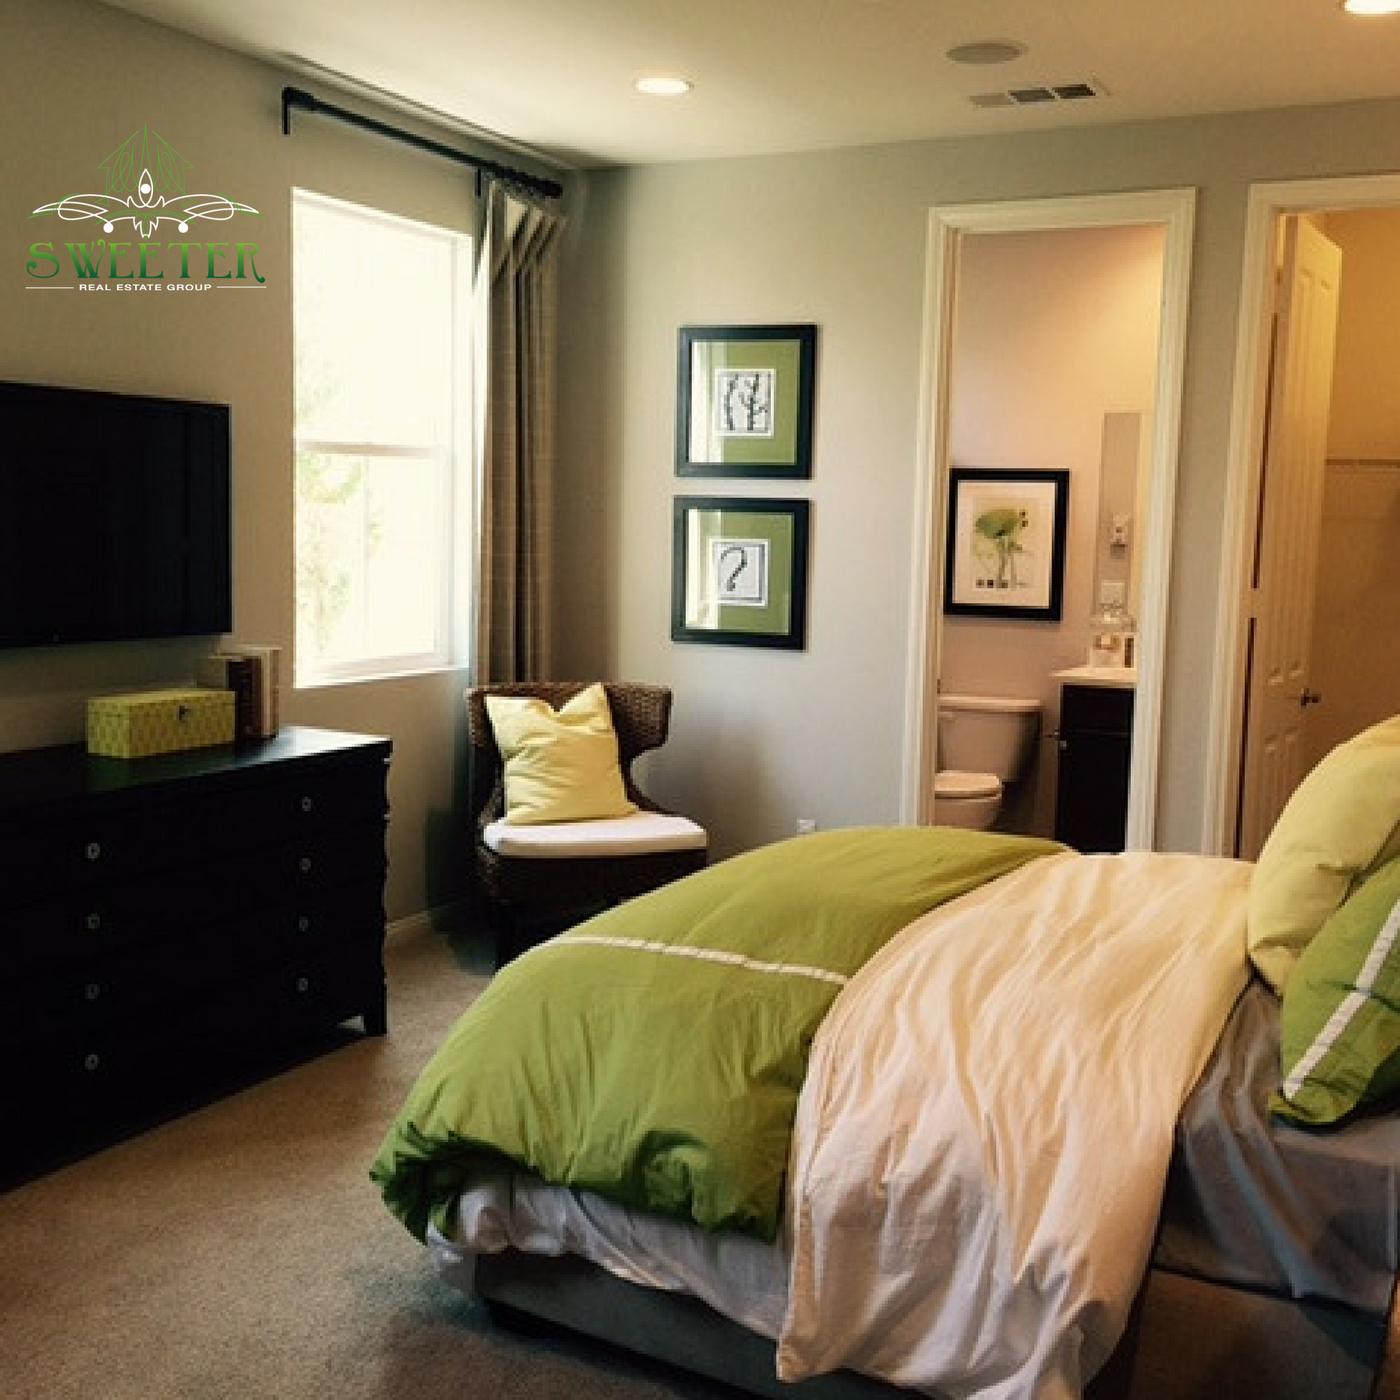 4 Bedroom Corona Houses For Sale | 92879 Zip Code